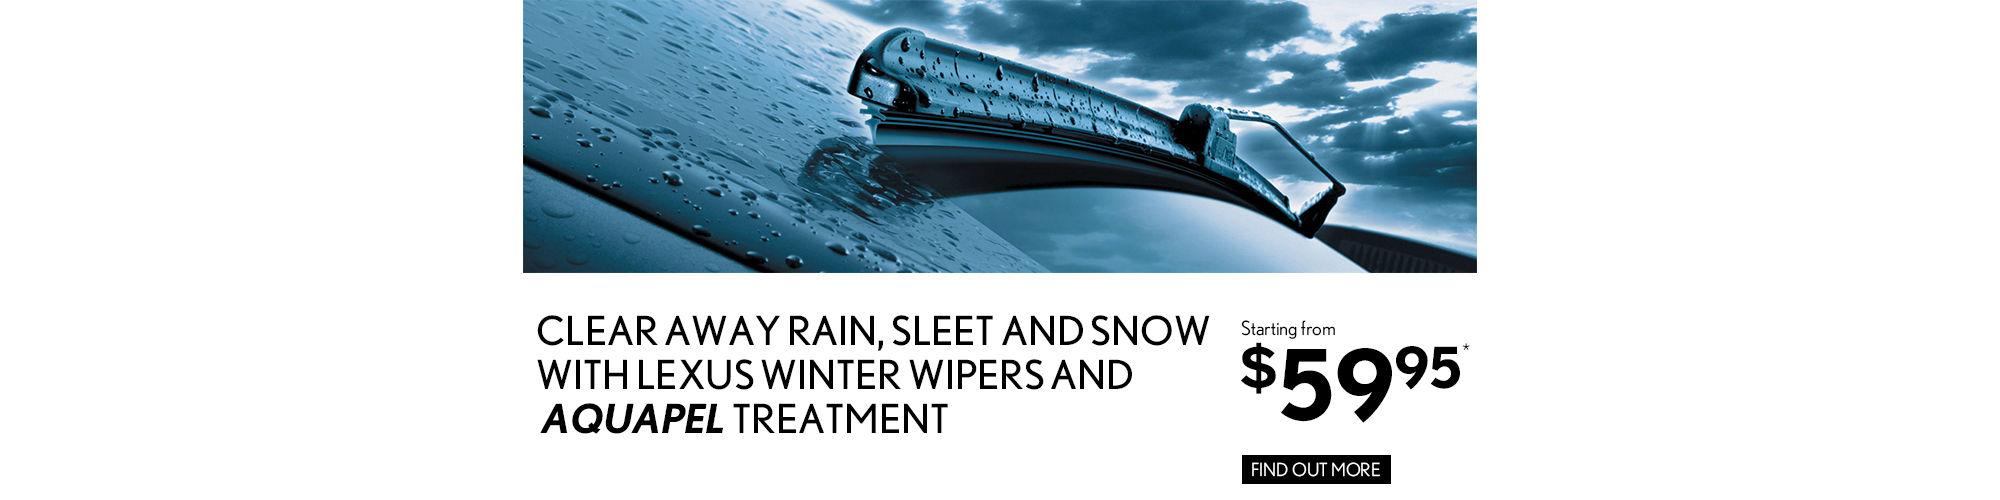 Aquapel and Winter Wipers